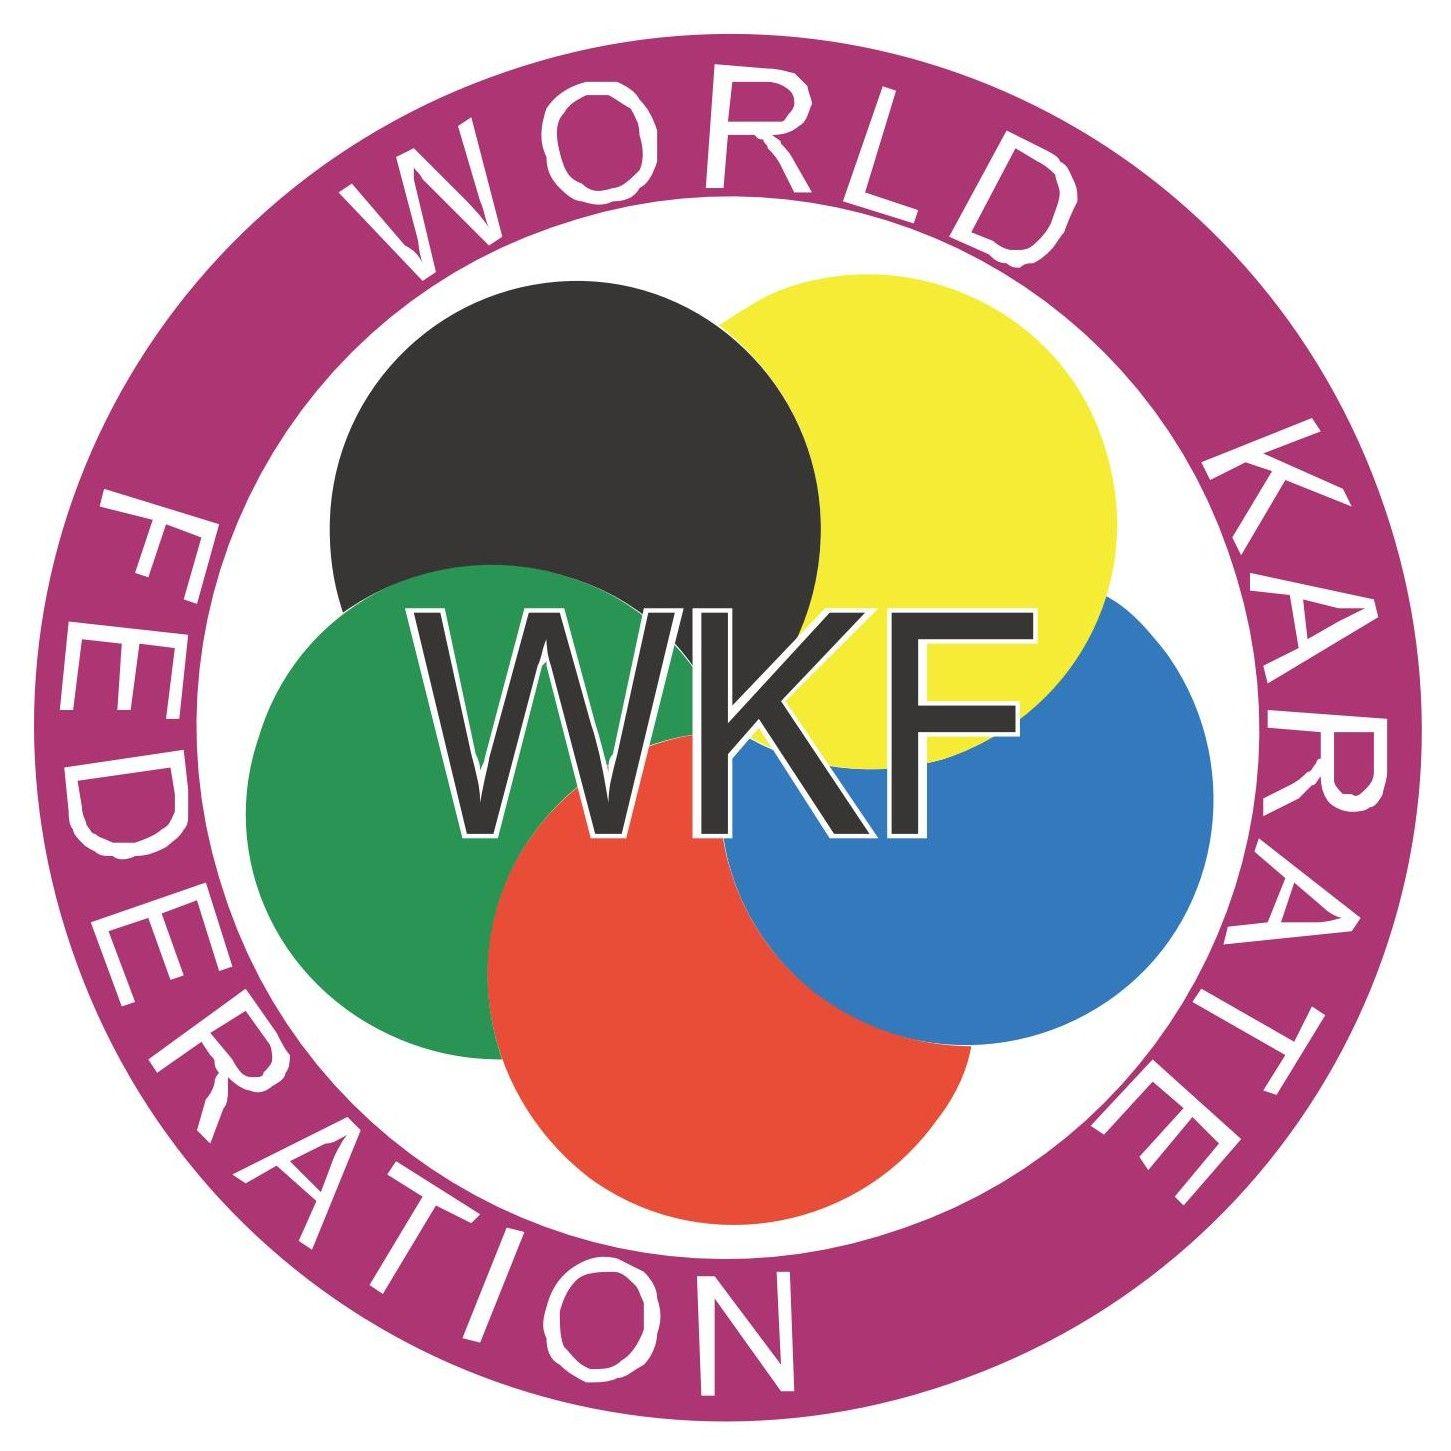 WKF – World Karate Federation Logo [EPS File] - ARISF, Association of the IOC Recognised International Sports Federations, eps, eps … | Karate, Logos, Karate school